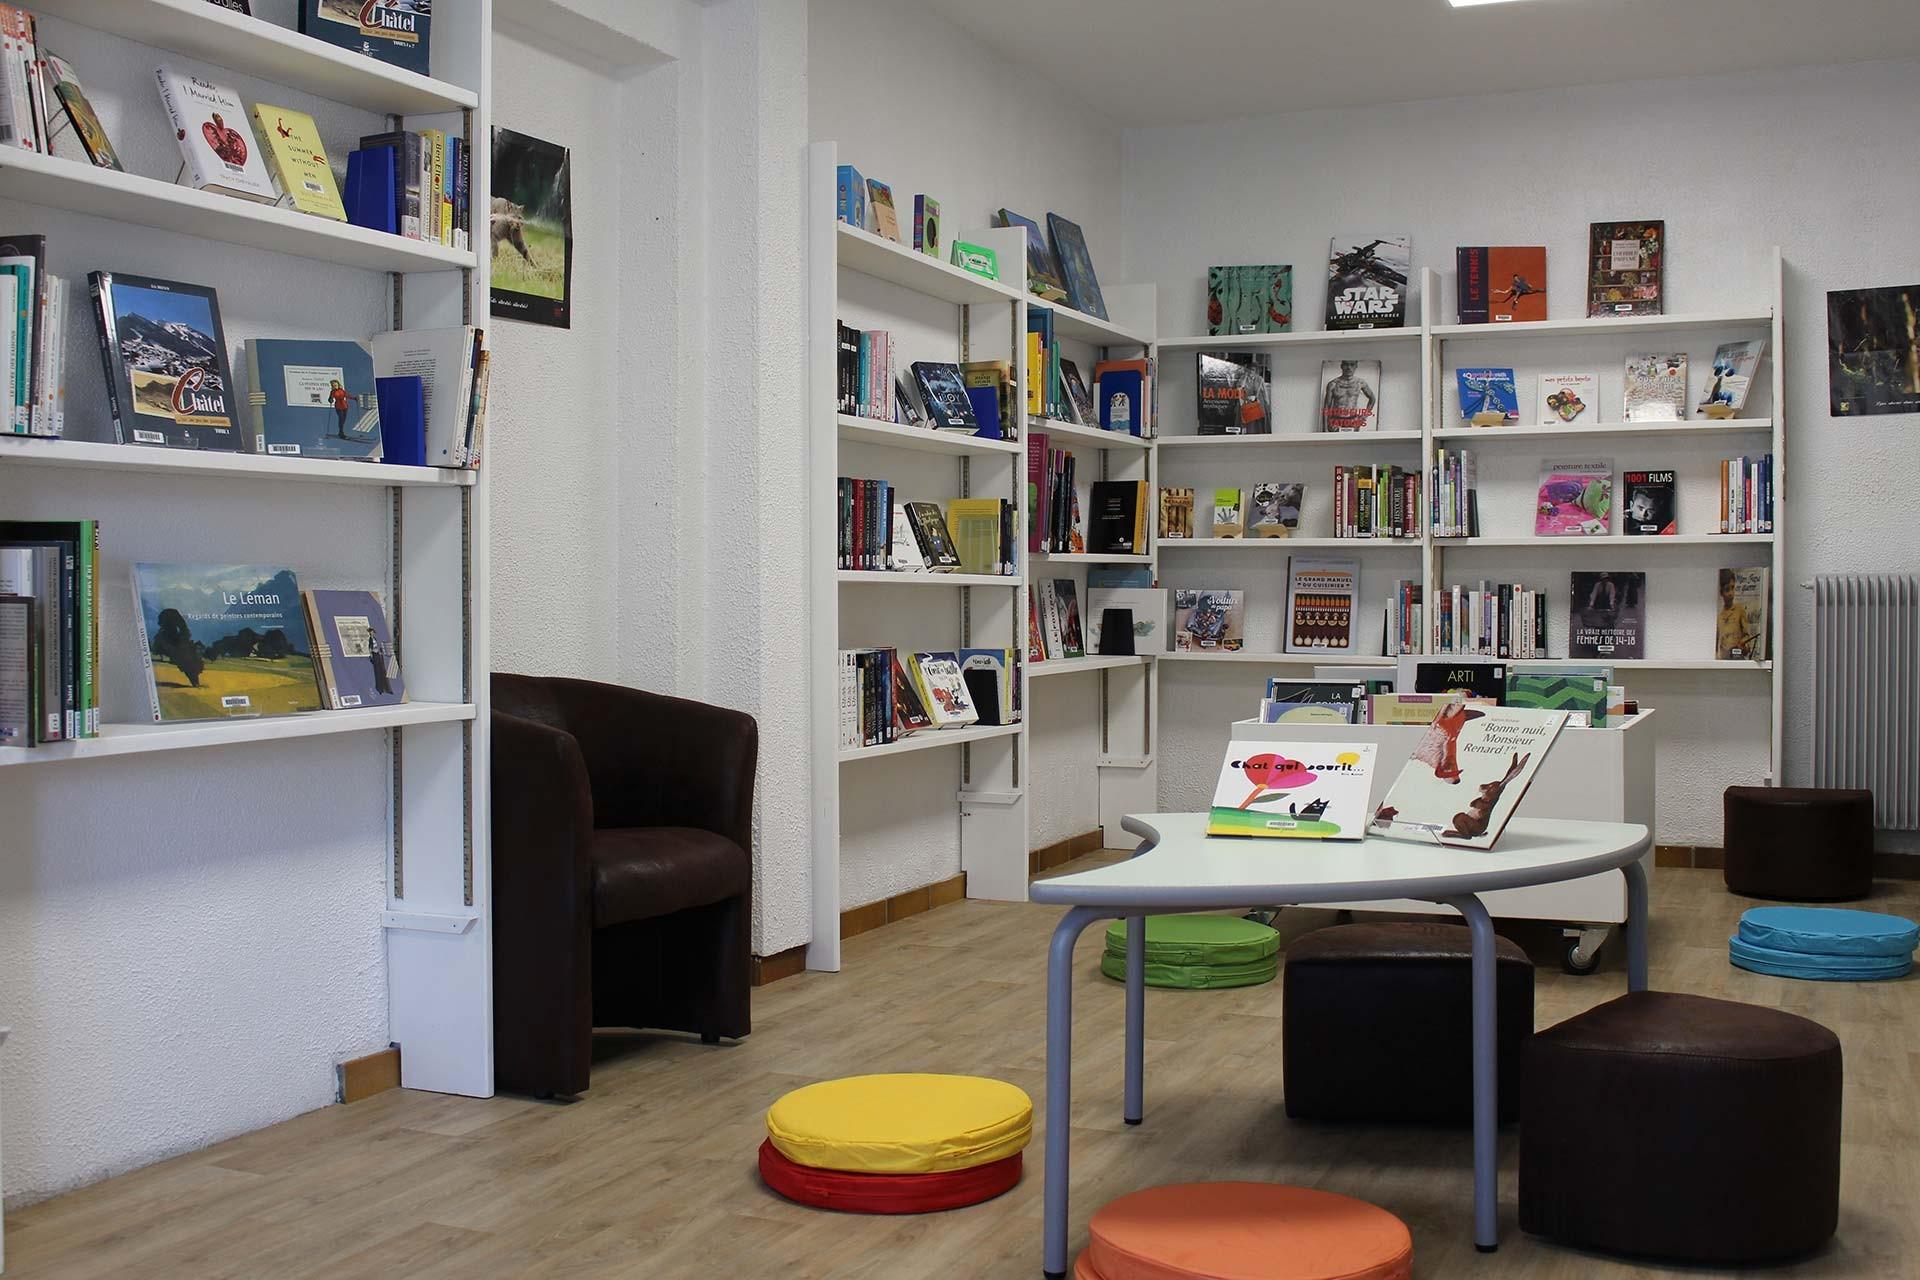 Châtel Bibliotheek